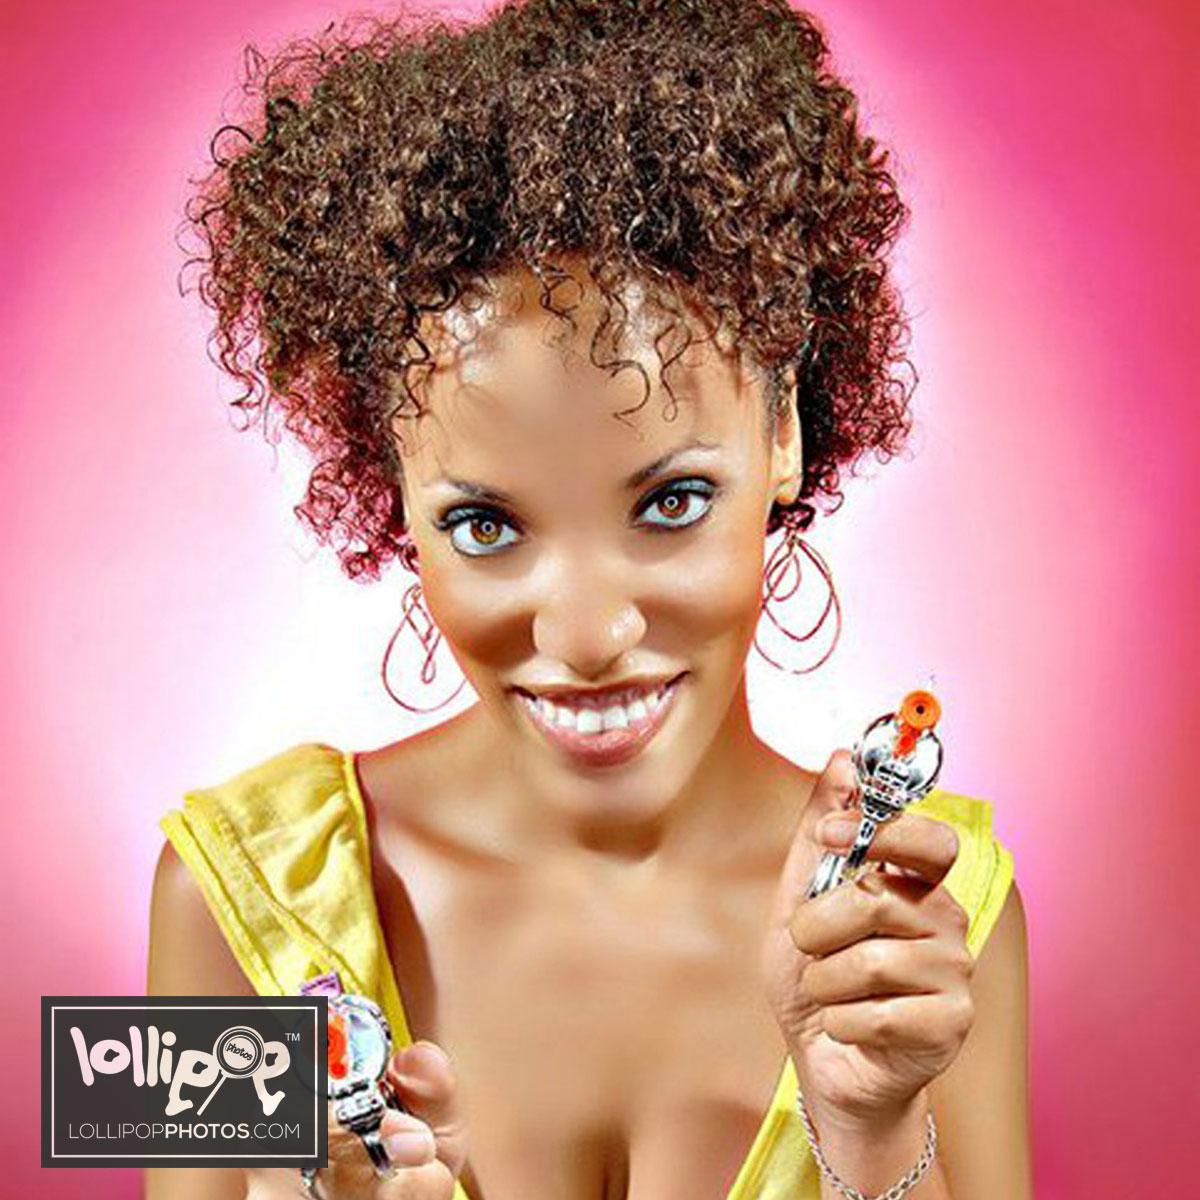 msdig-nora-canfield-lollipop-photos-058.jpg